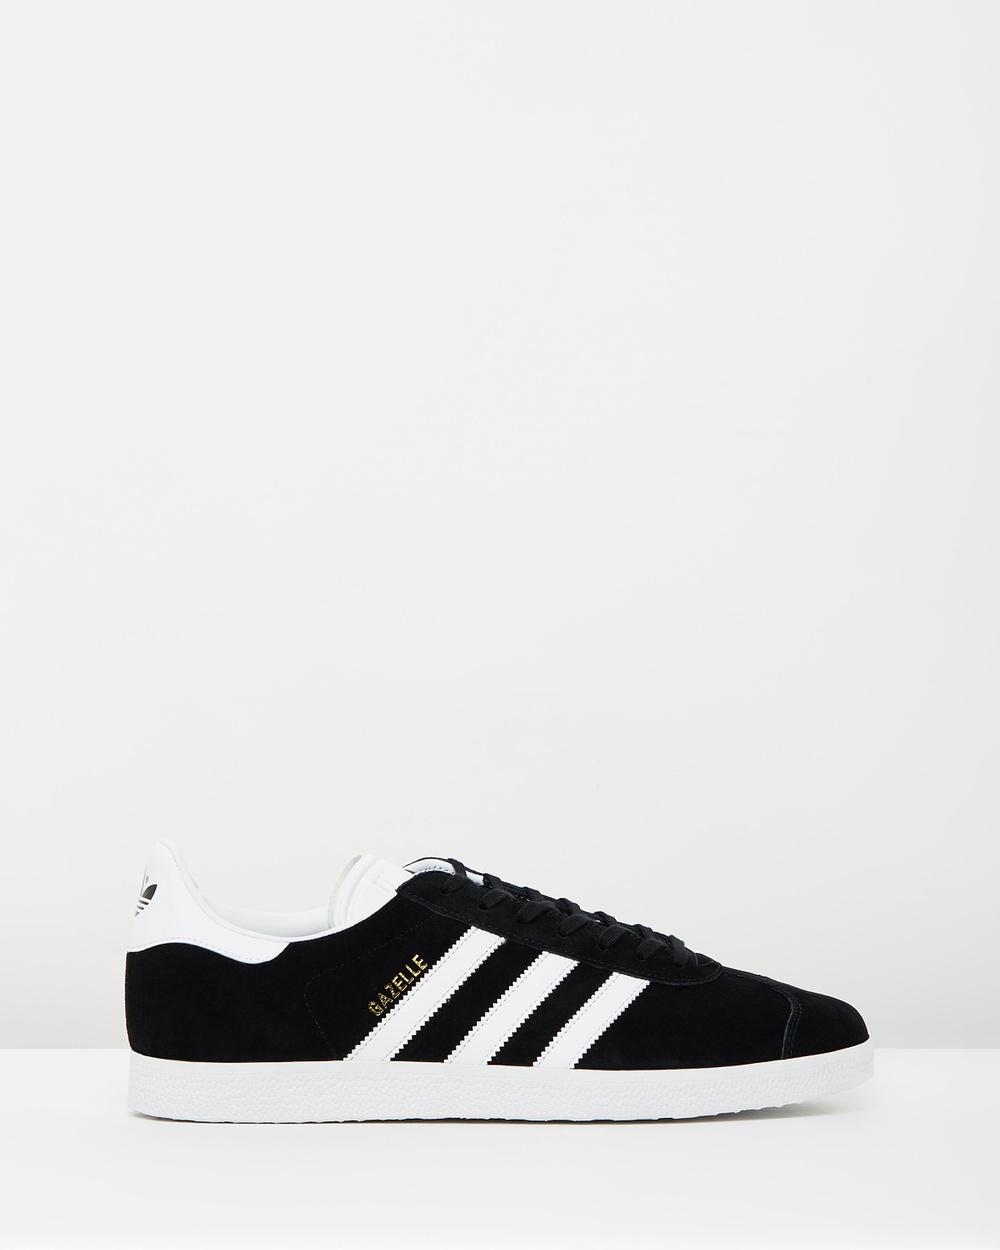 adidas Originals Gazelle Shoes Sneakers Black